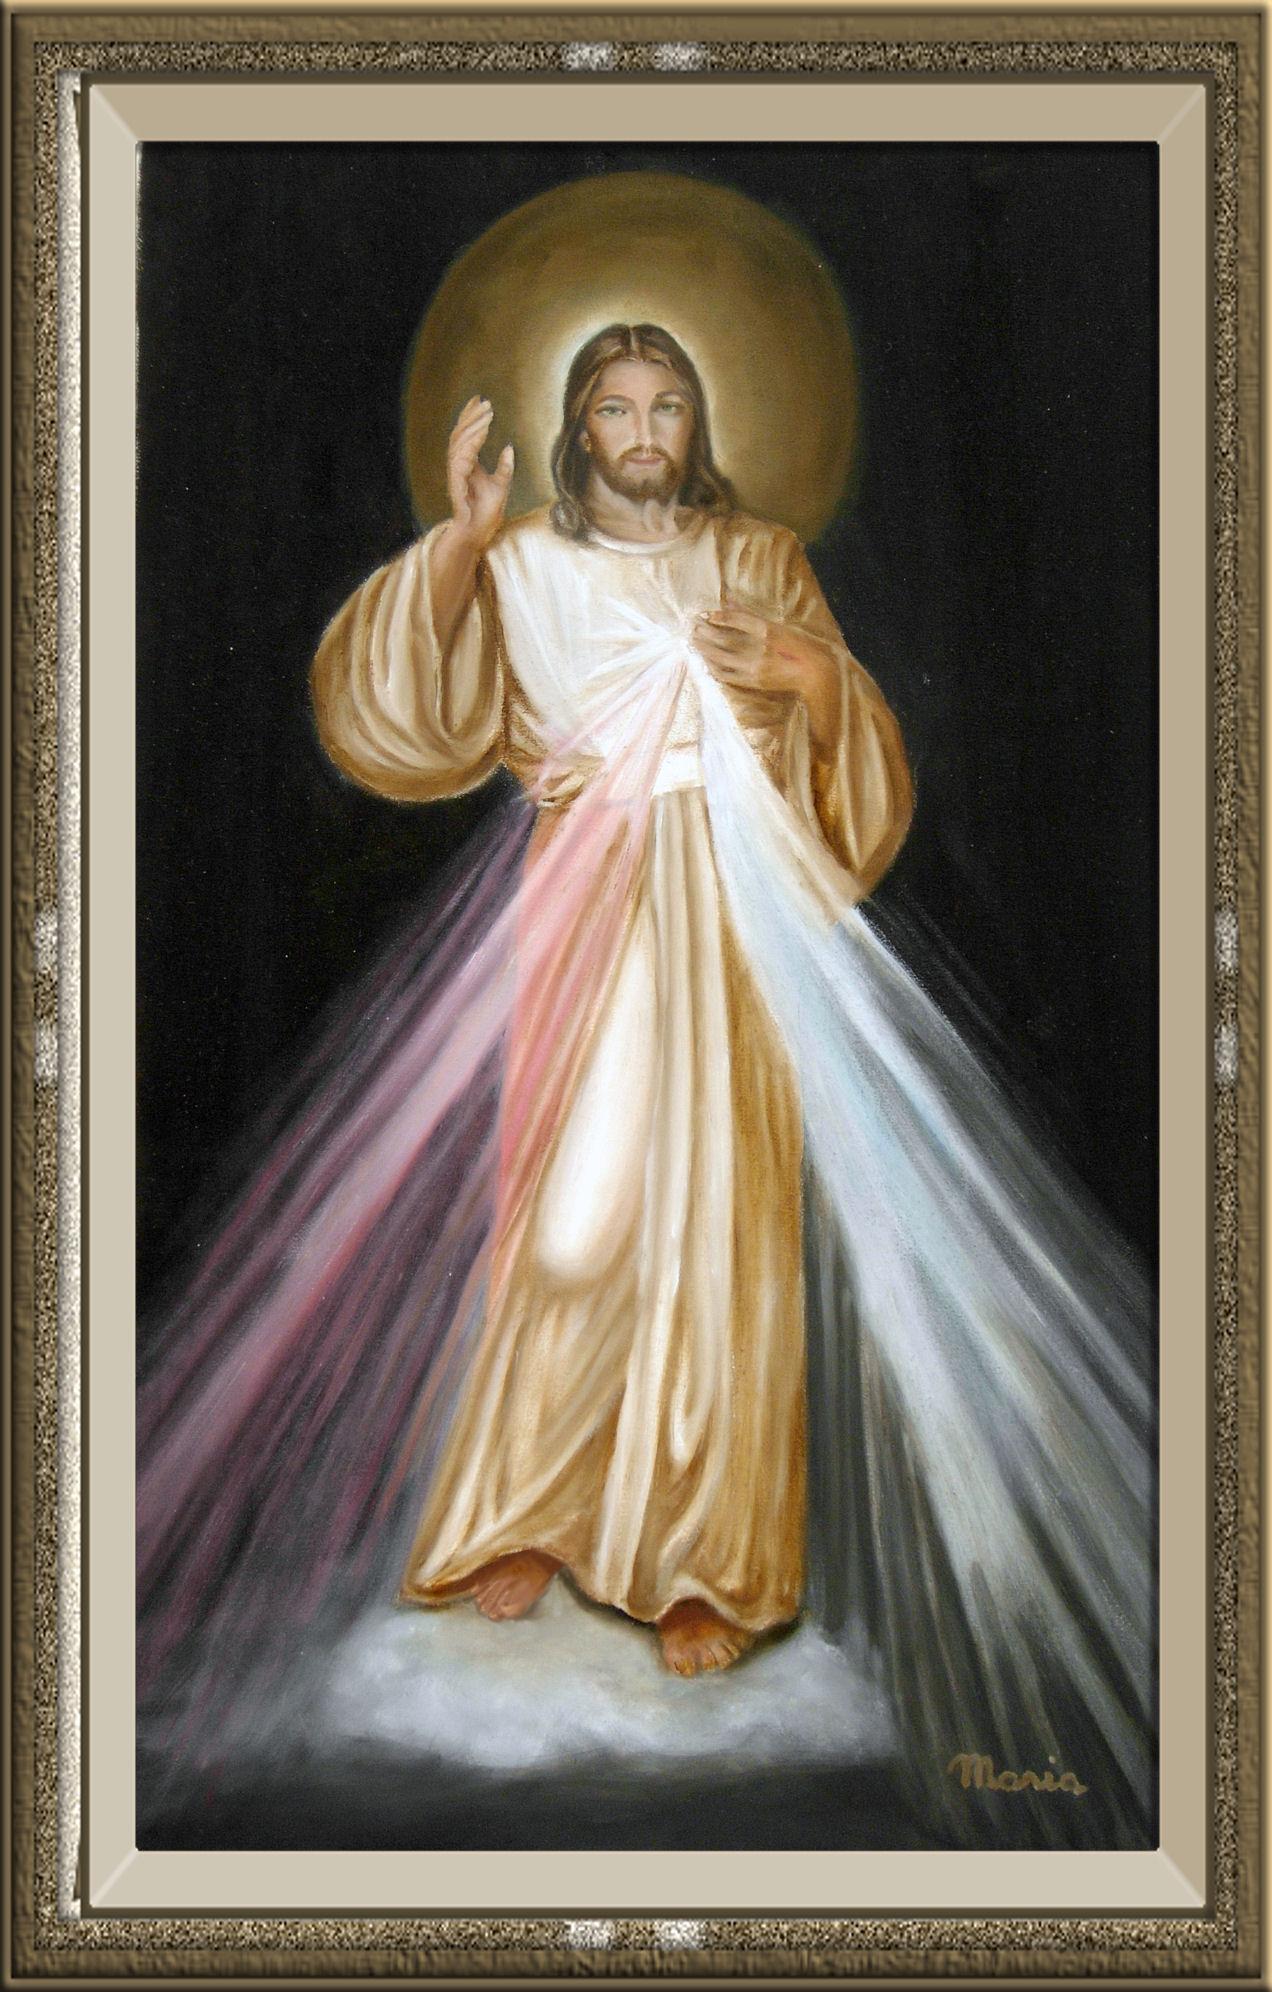 Divina misericordia logo